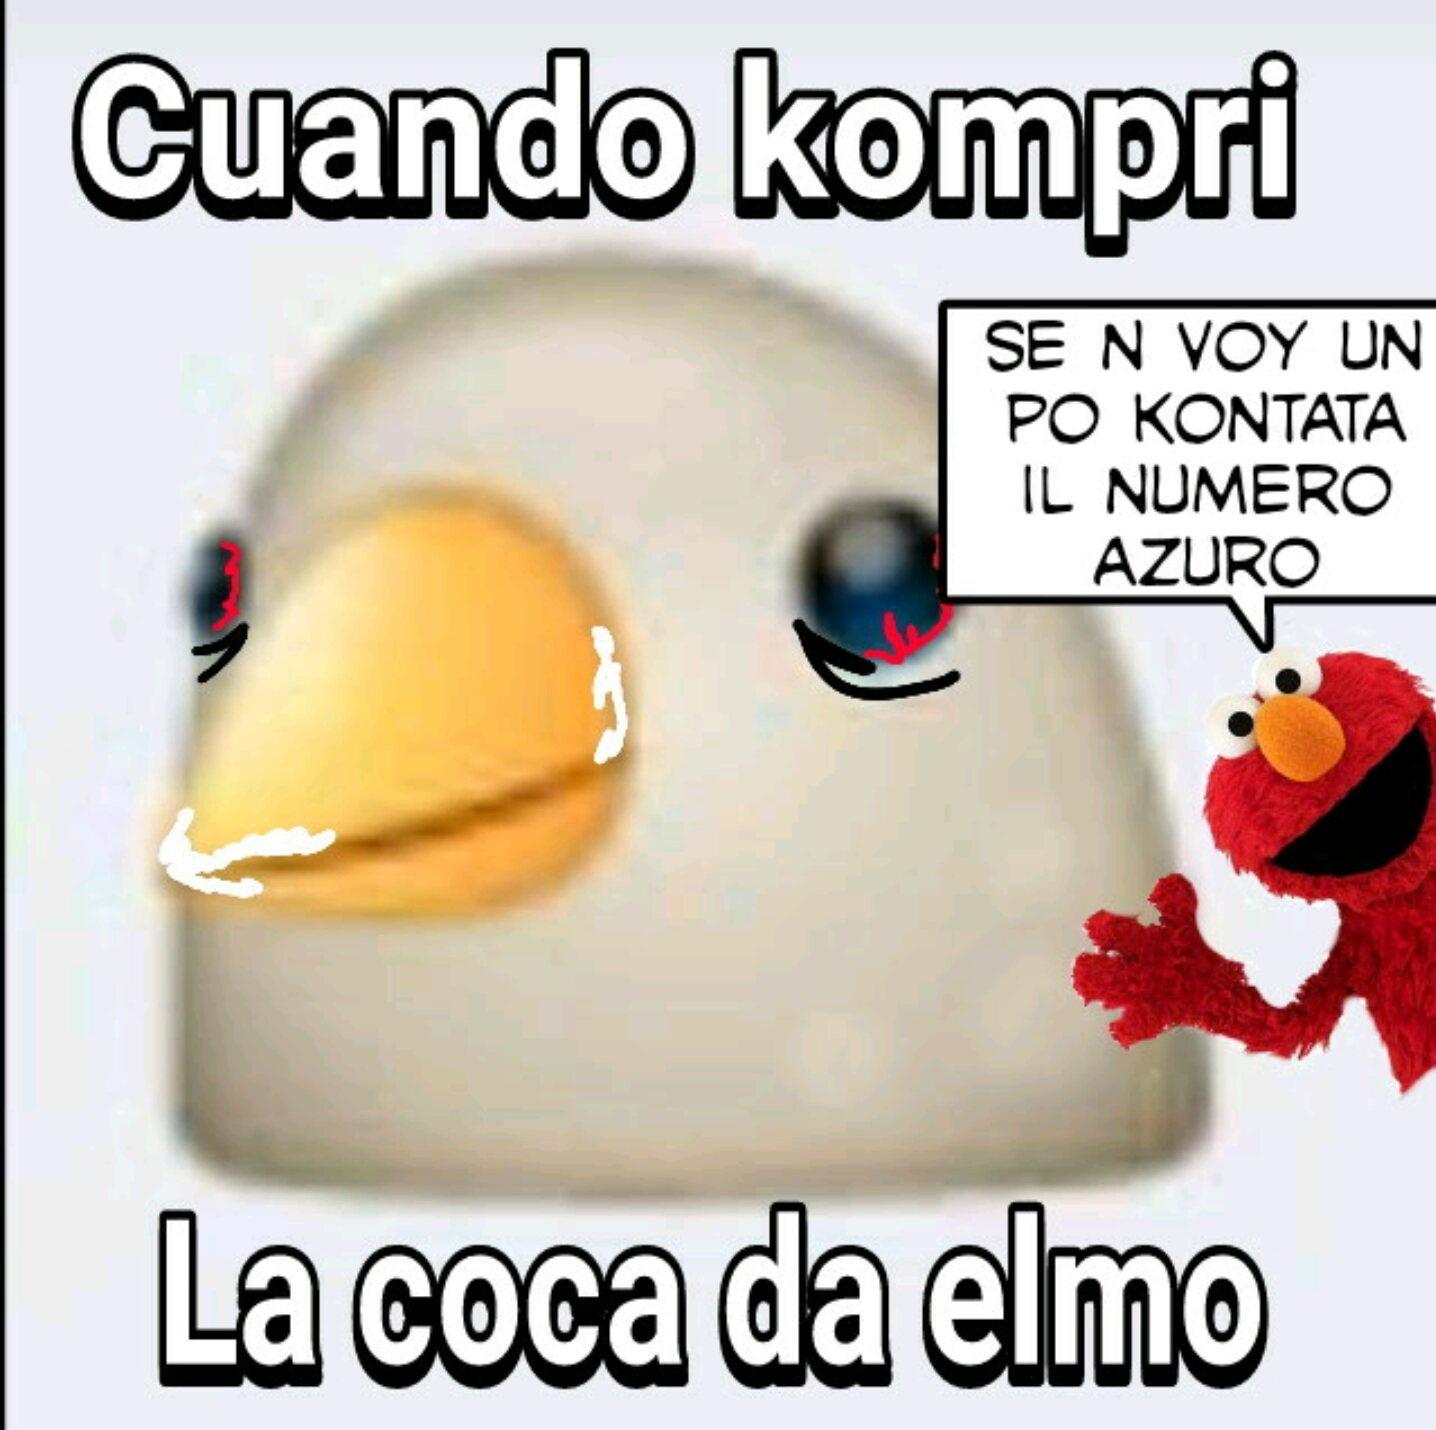 Icsdi - meme